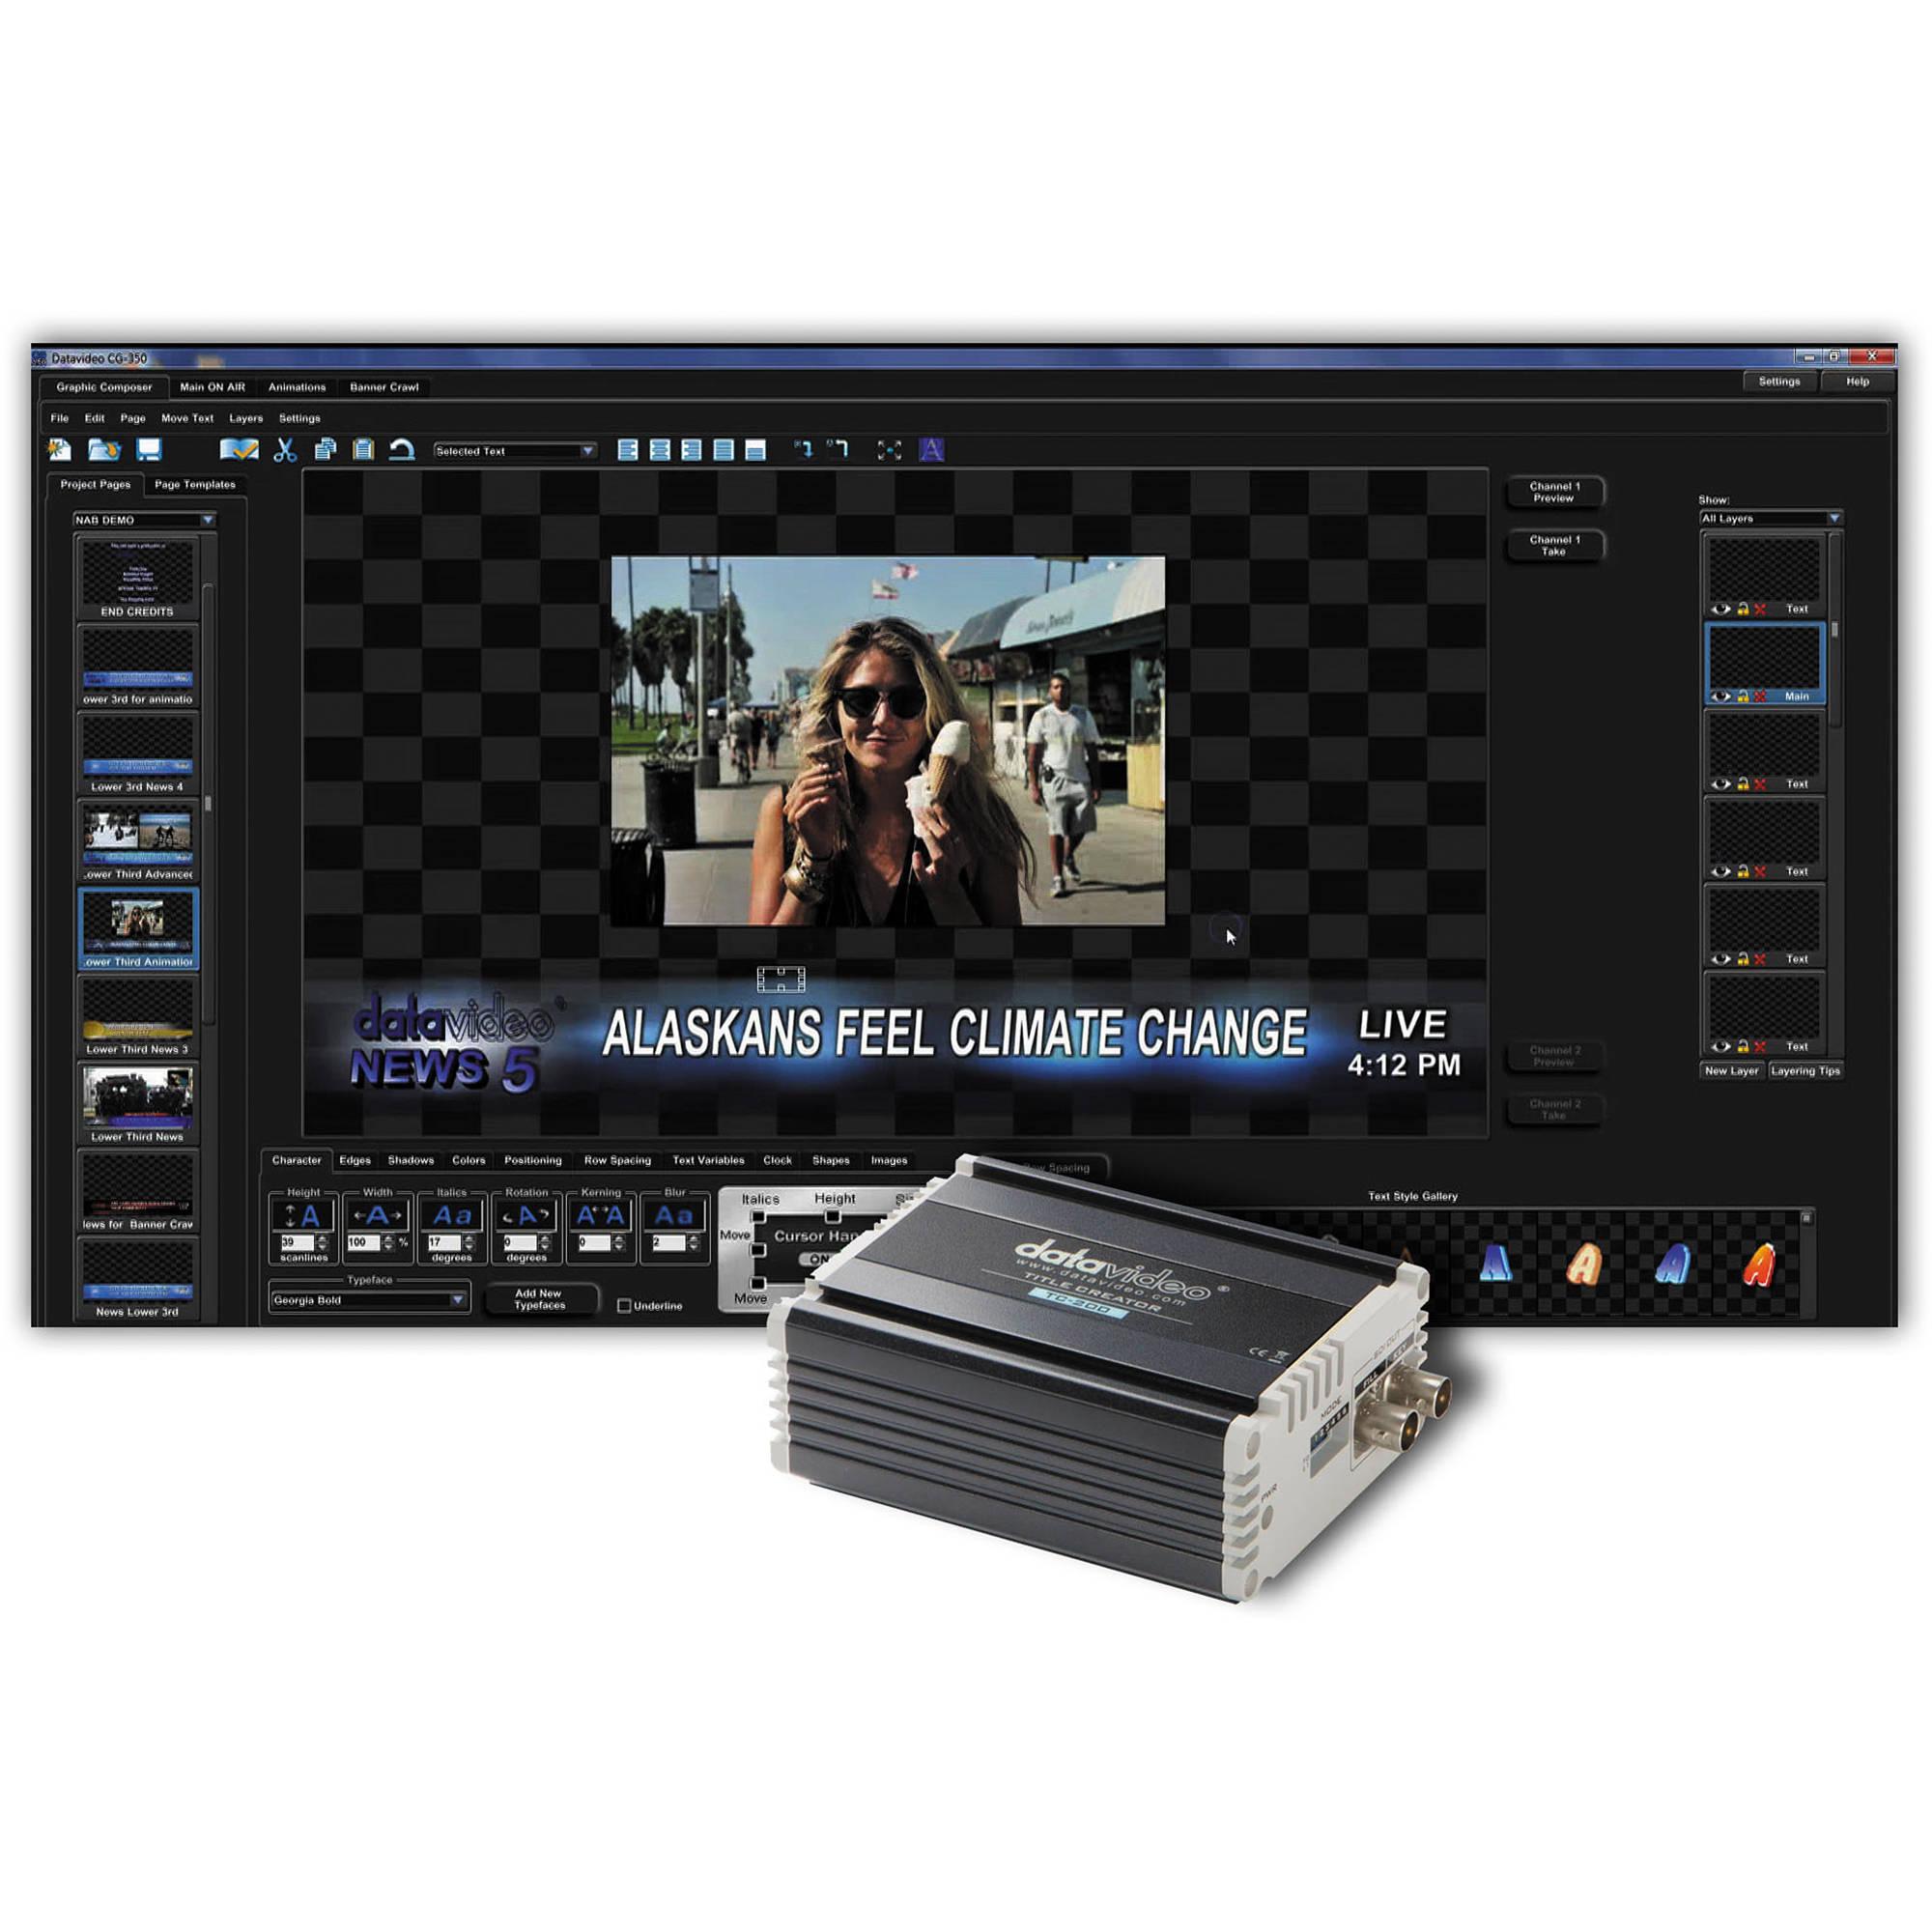 Datavideo CG-350TC Kit with CG-350 HD/SD Character Generator and TC-200  HD/SD Character Generator Kit